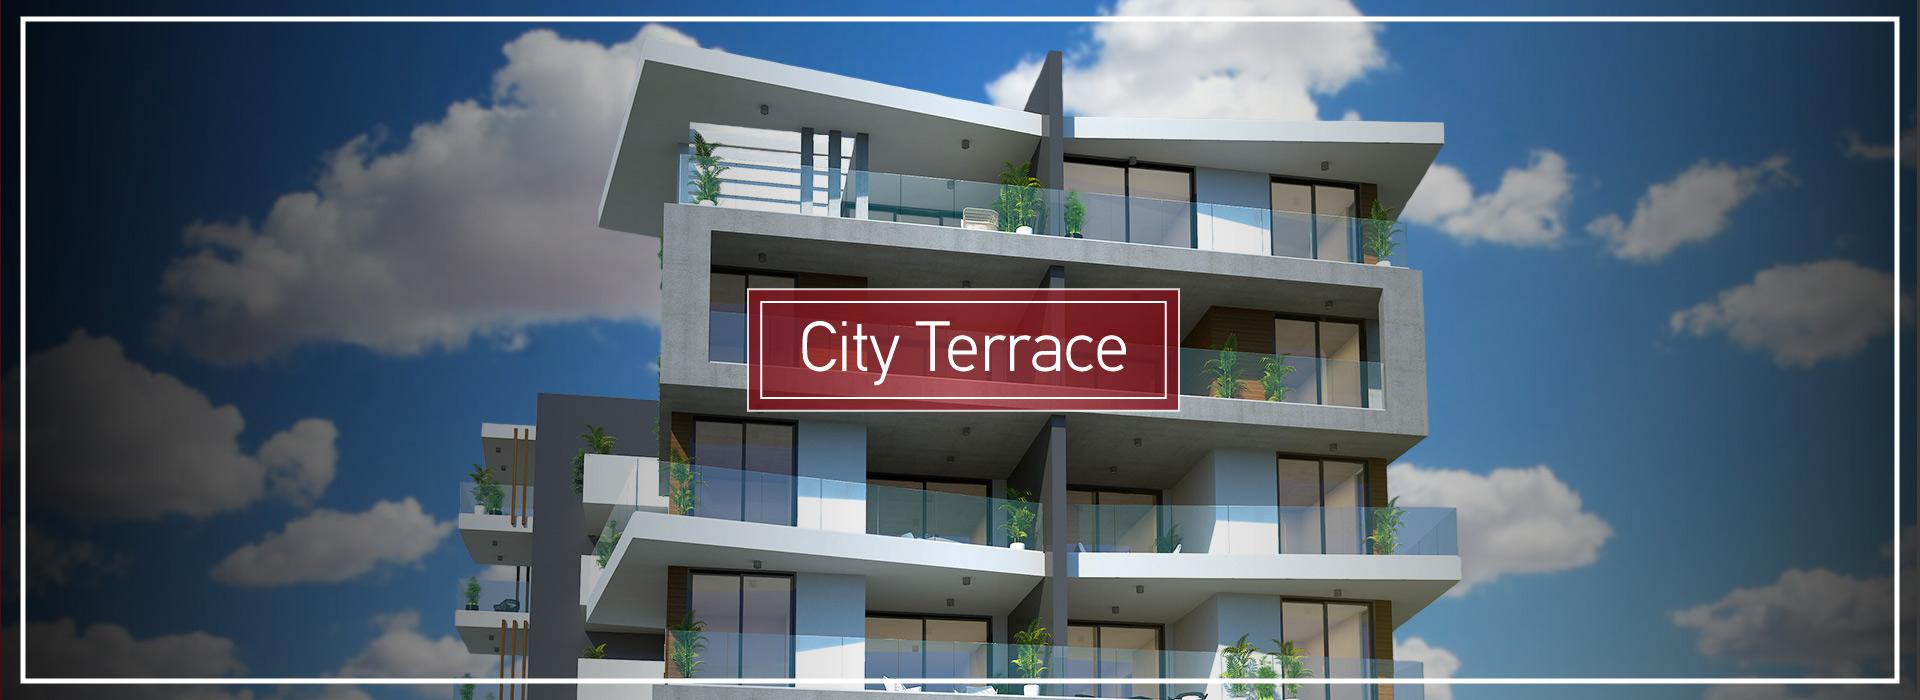 CITY TERRACE